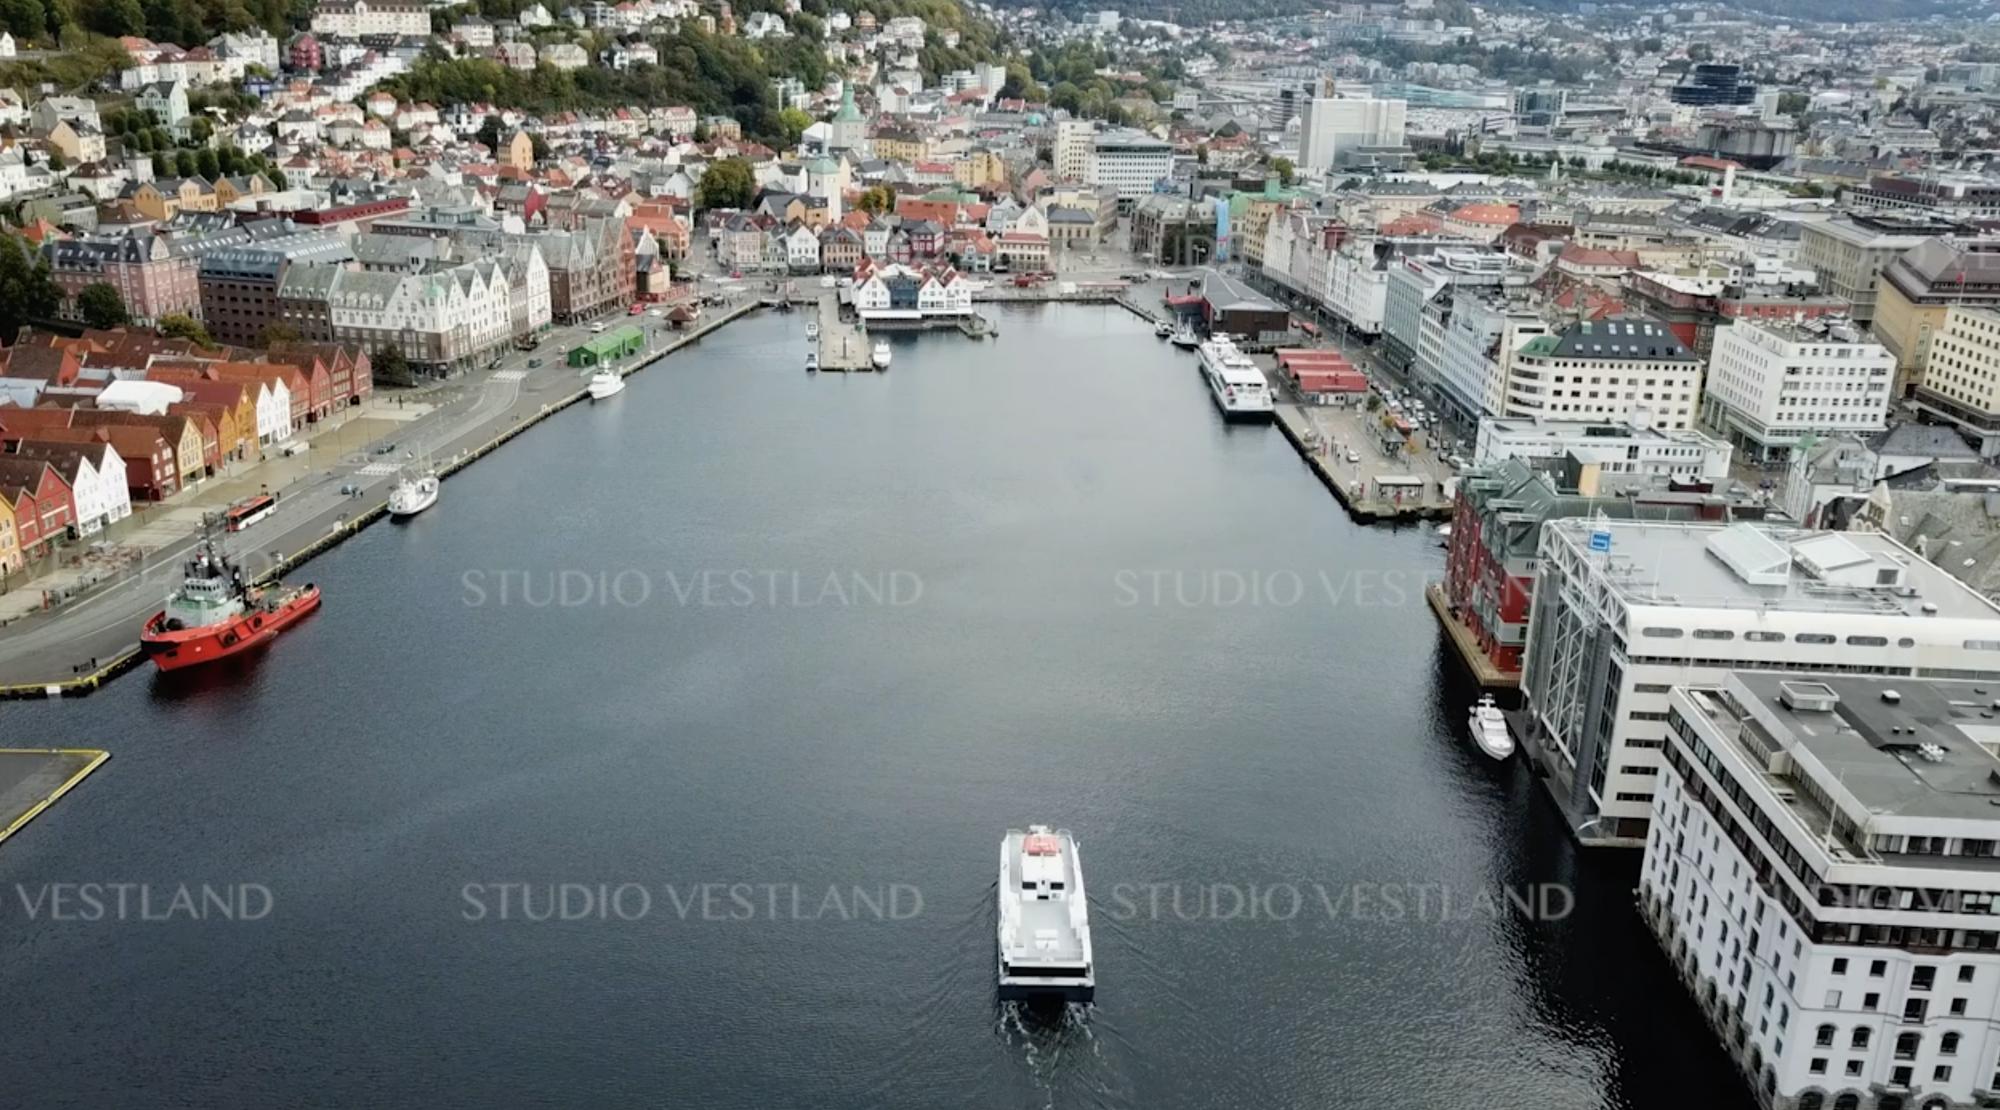 Studio Vestland - Bergen V16